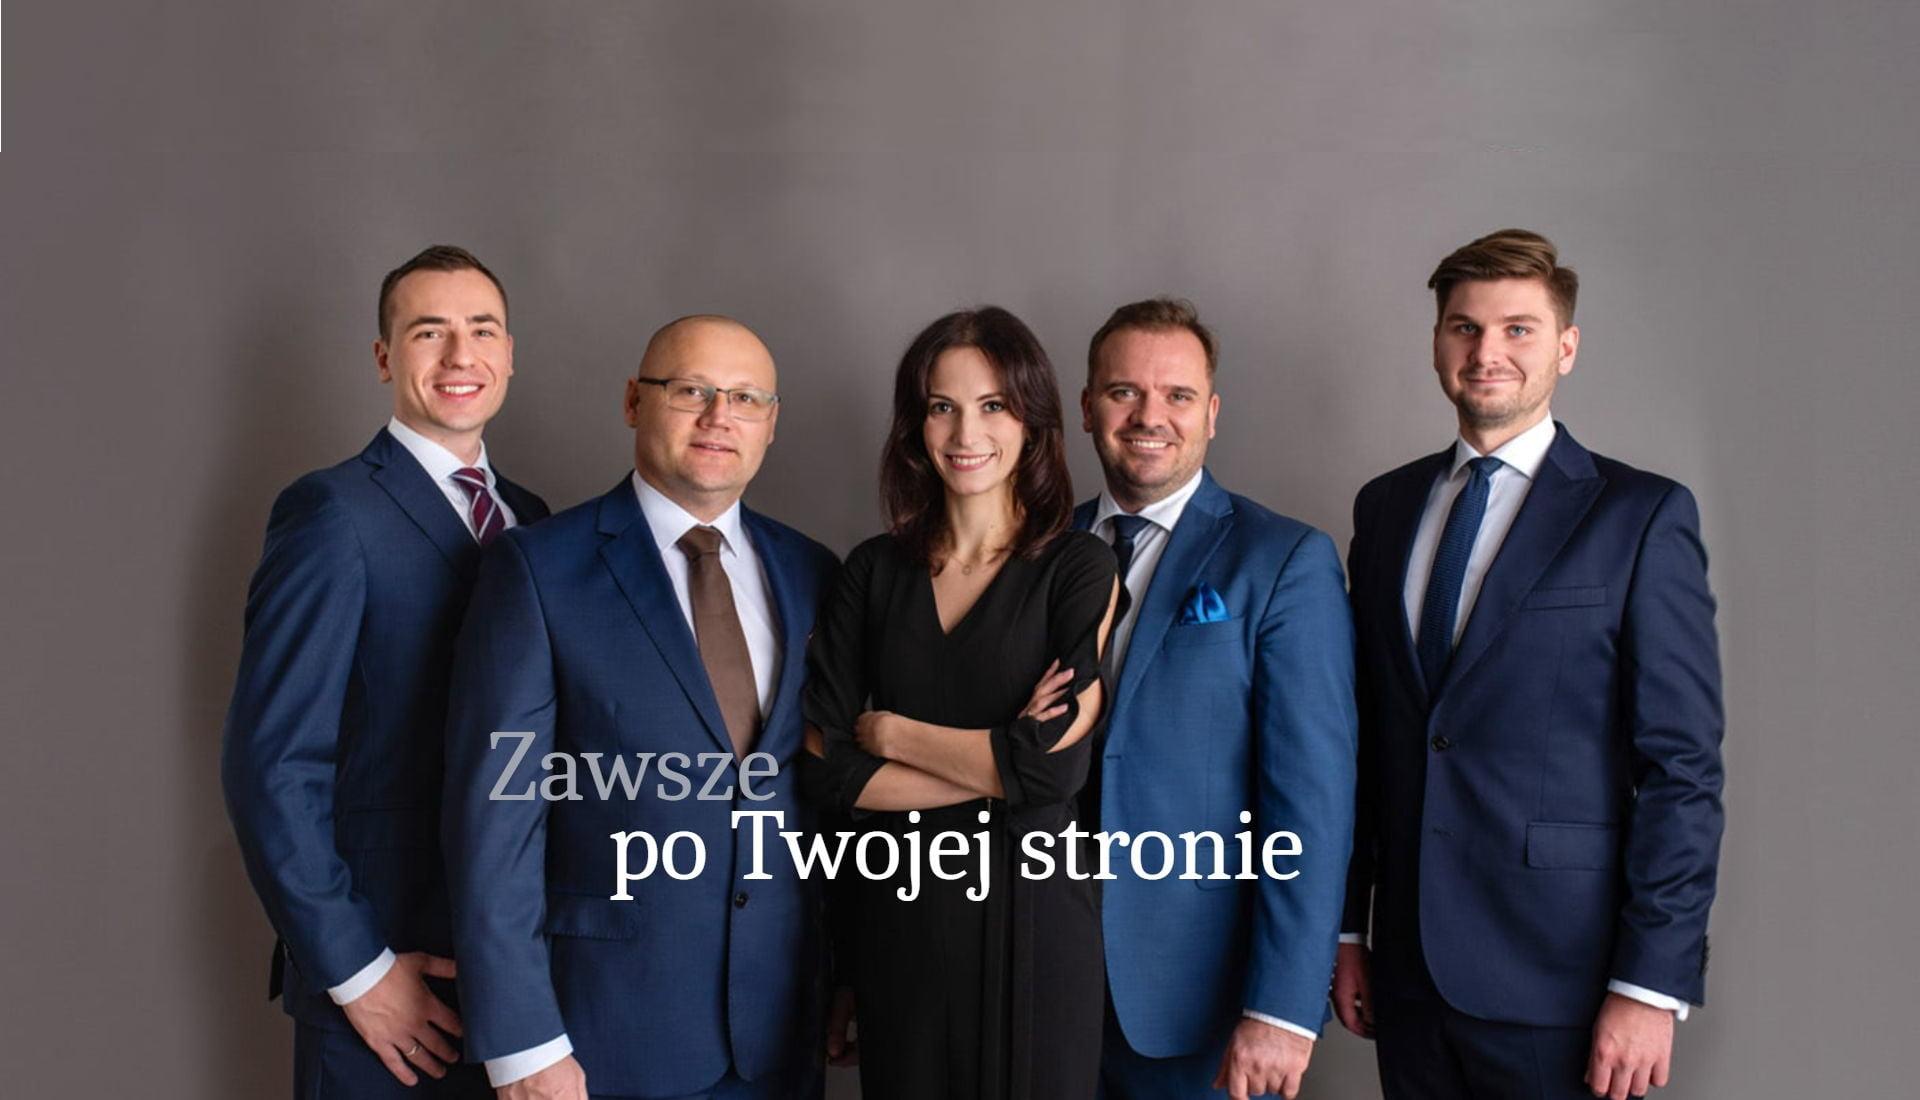 adwokat ambicki team